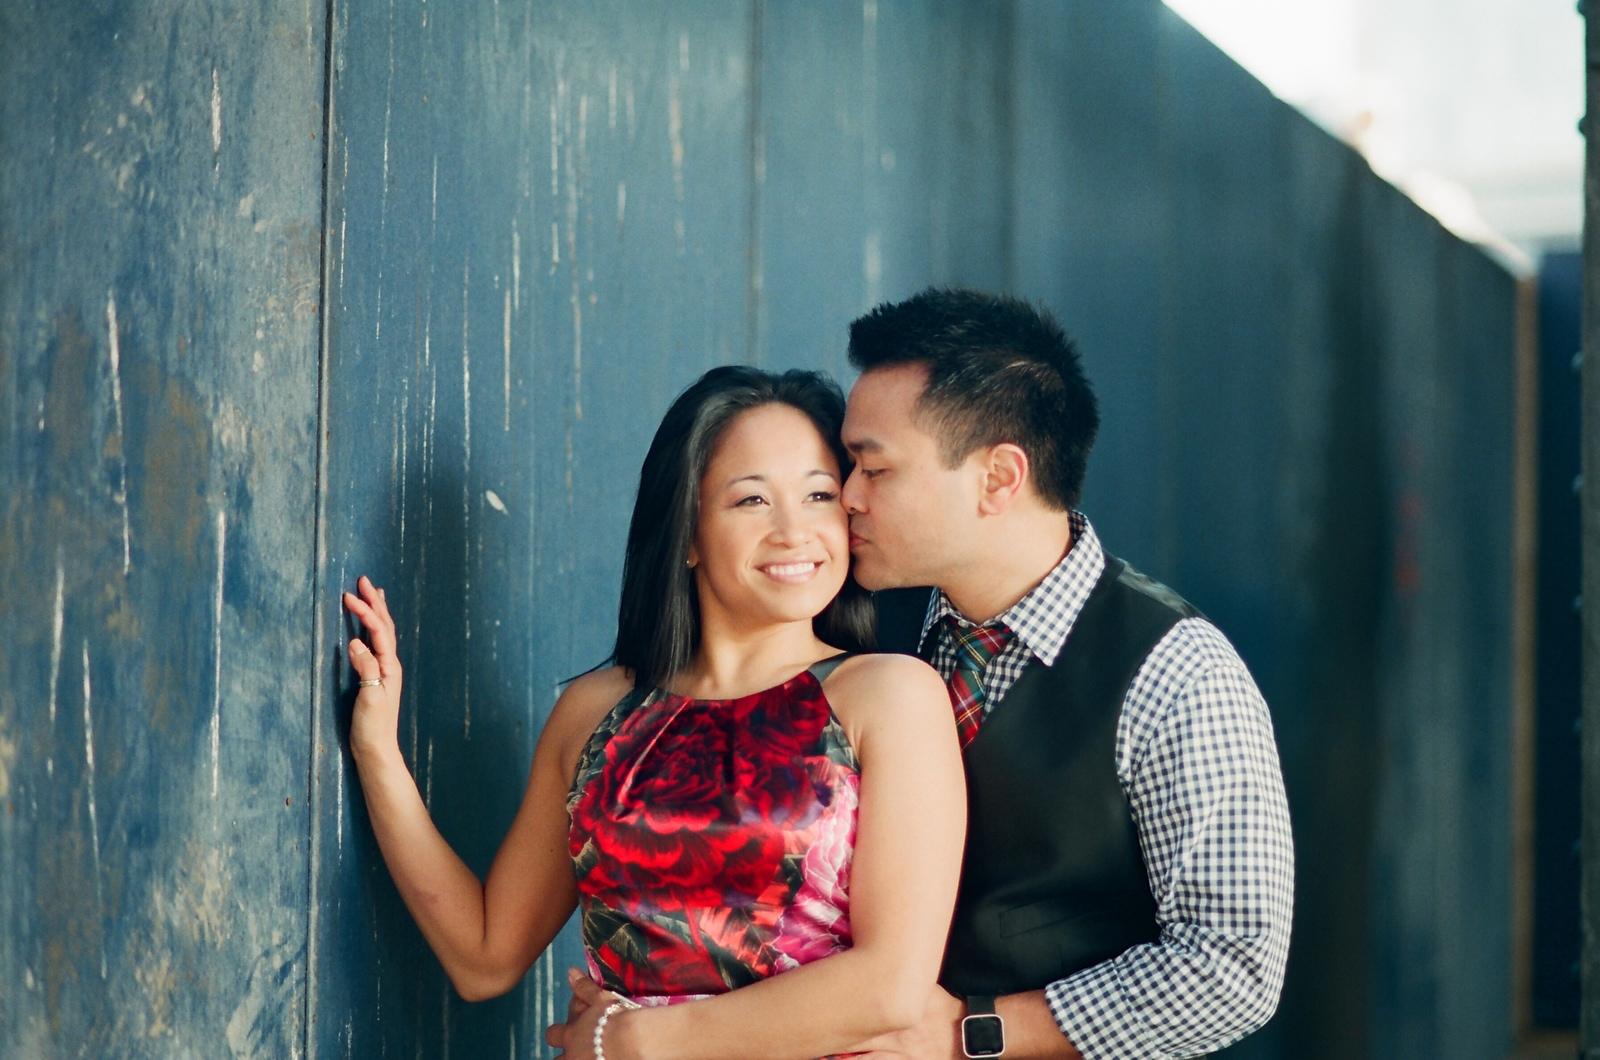 nyc engaged couple groom kissing bride's cheek